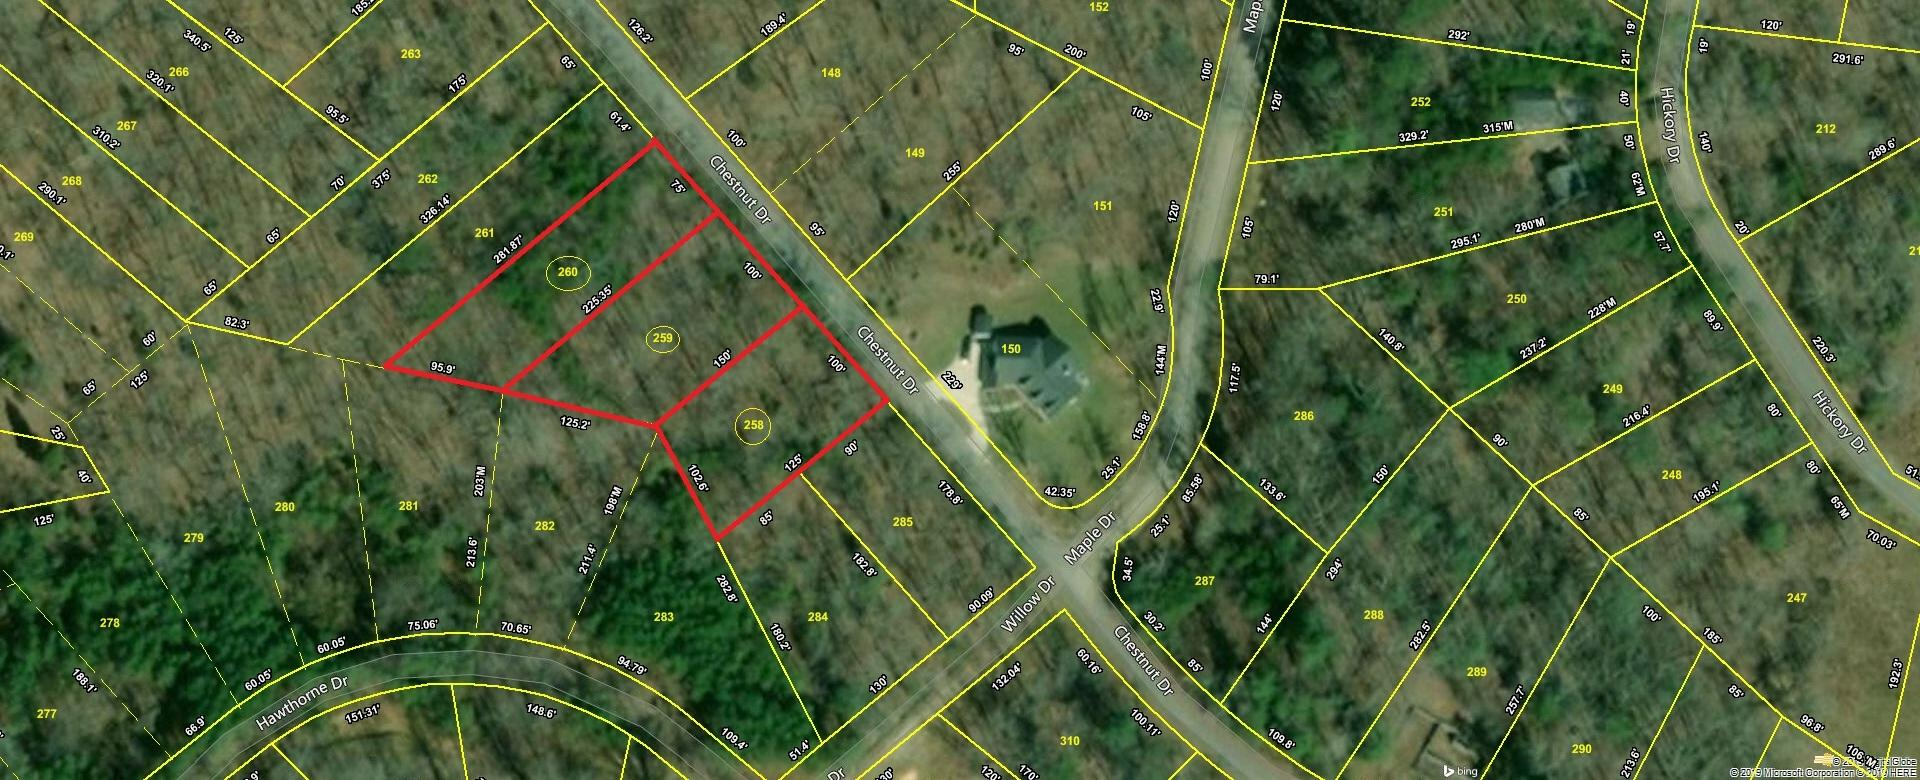 Lot 259 Chestnut Dr, Spring City, TN 37381